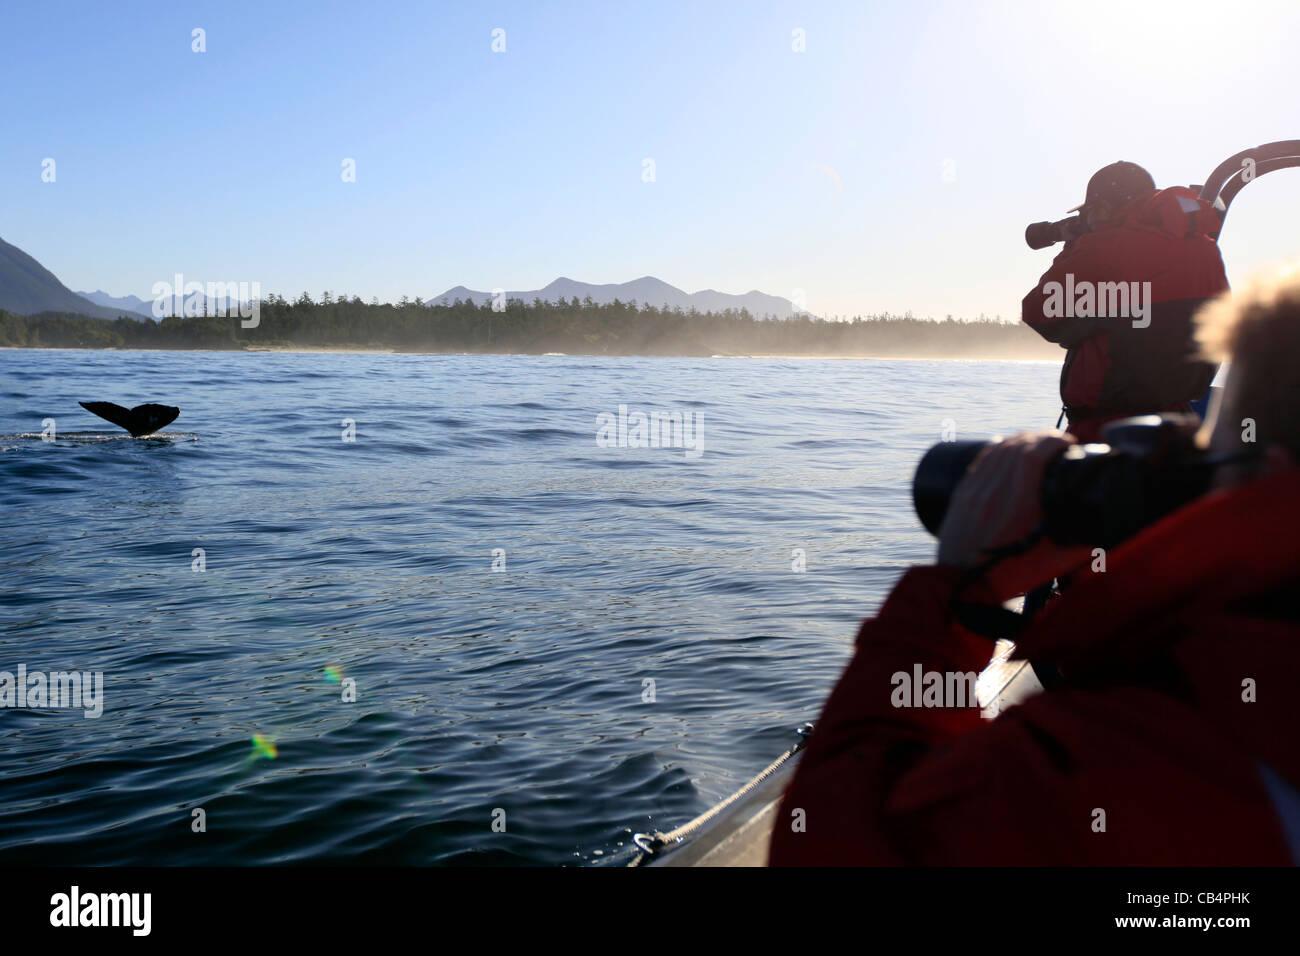 Tofino Whale Watching - Stock Image